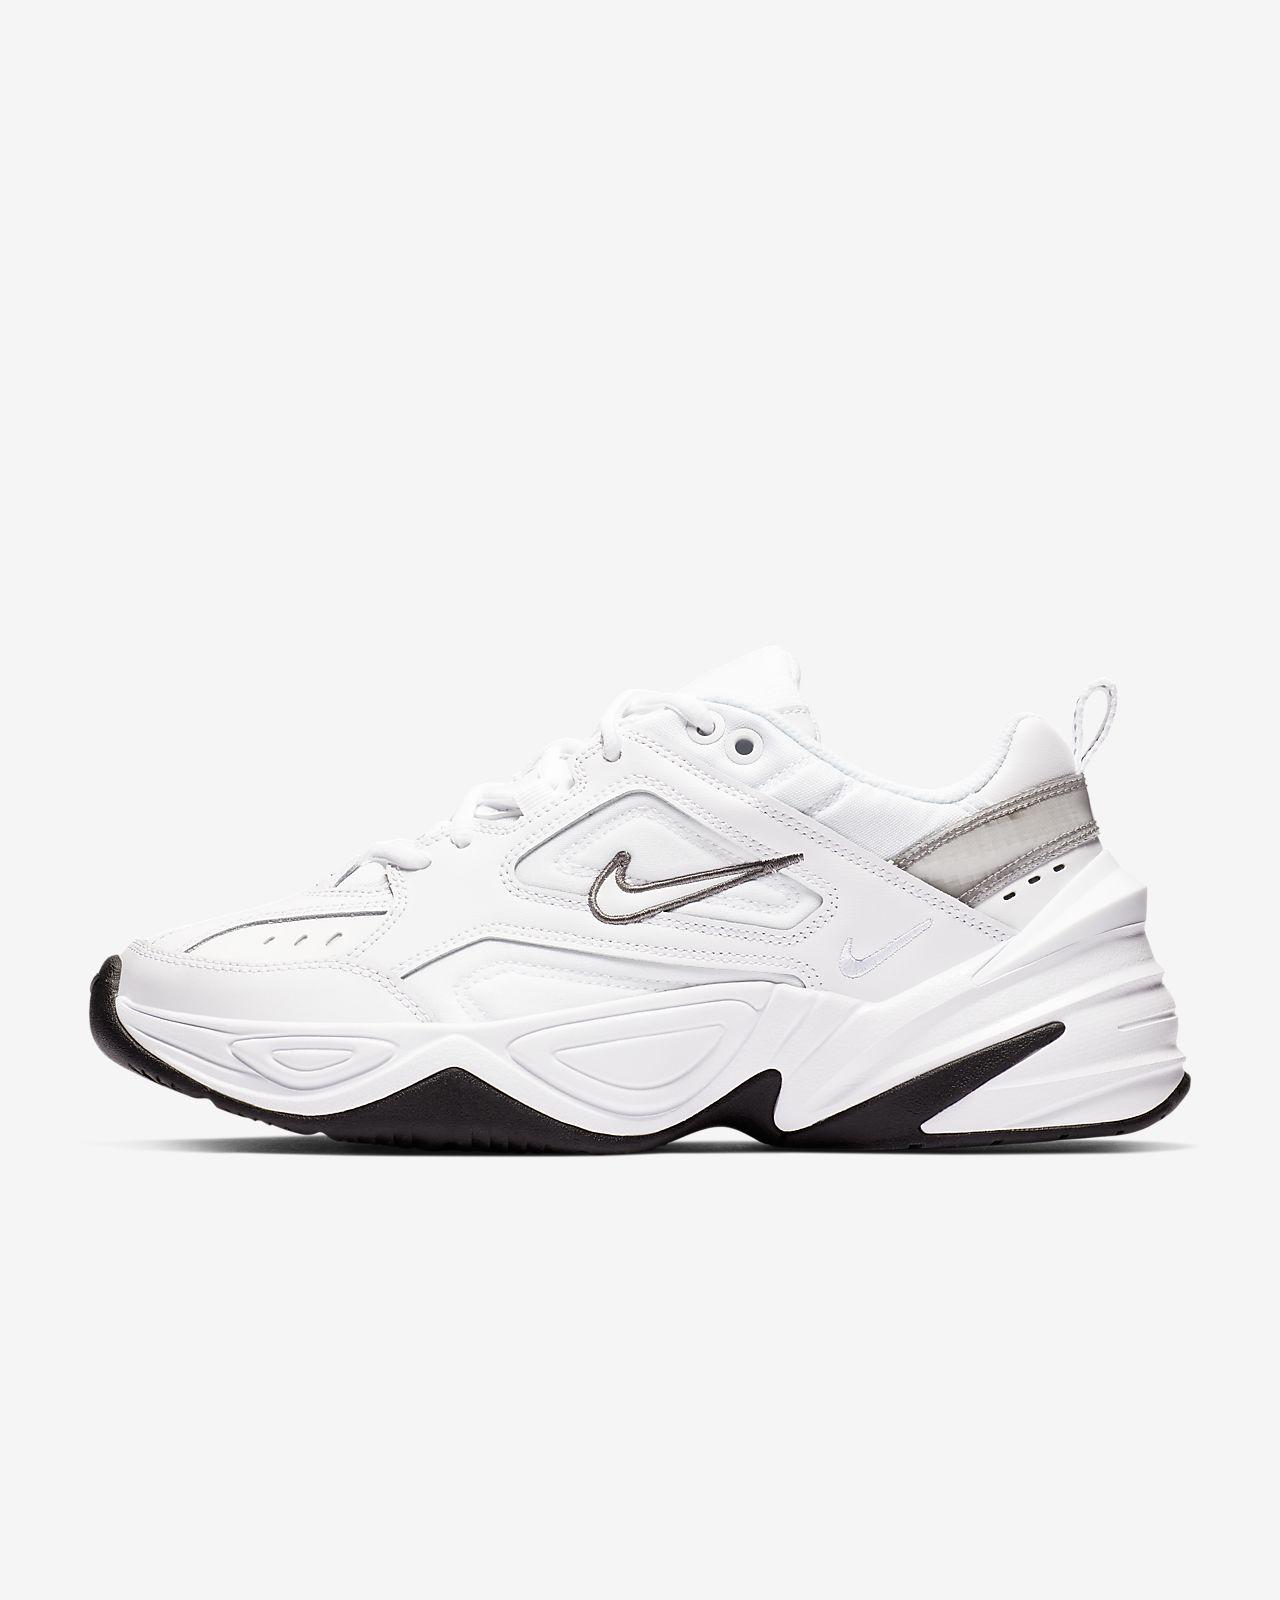 d9c0f3cc Low Resolution Кроссовки Nike M2K Tekno Кроссовки Nike M2K Tekno